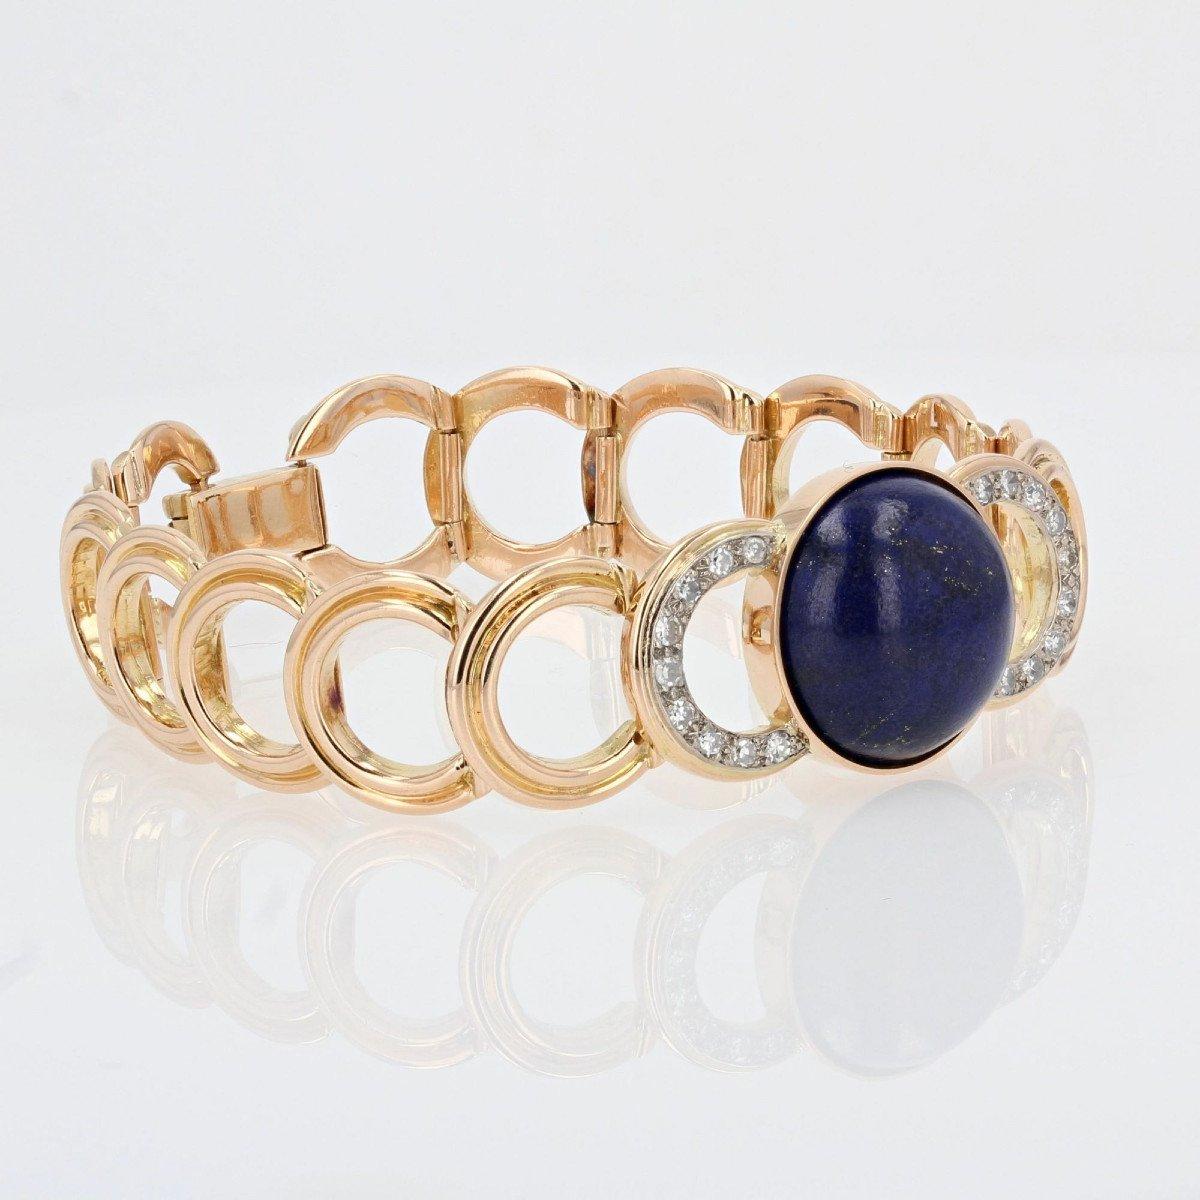 Gold Bracelet With Diamonds And Its Lapis Lazuli Cabochon-photo-3